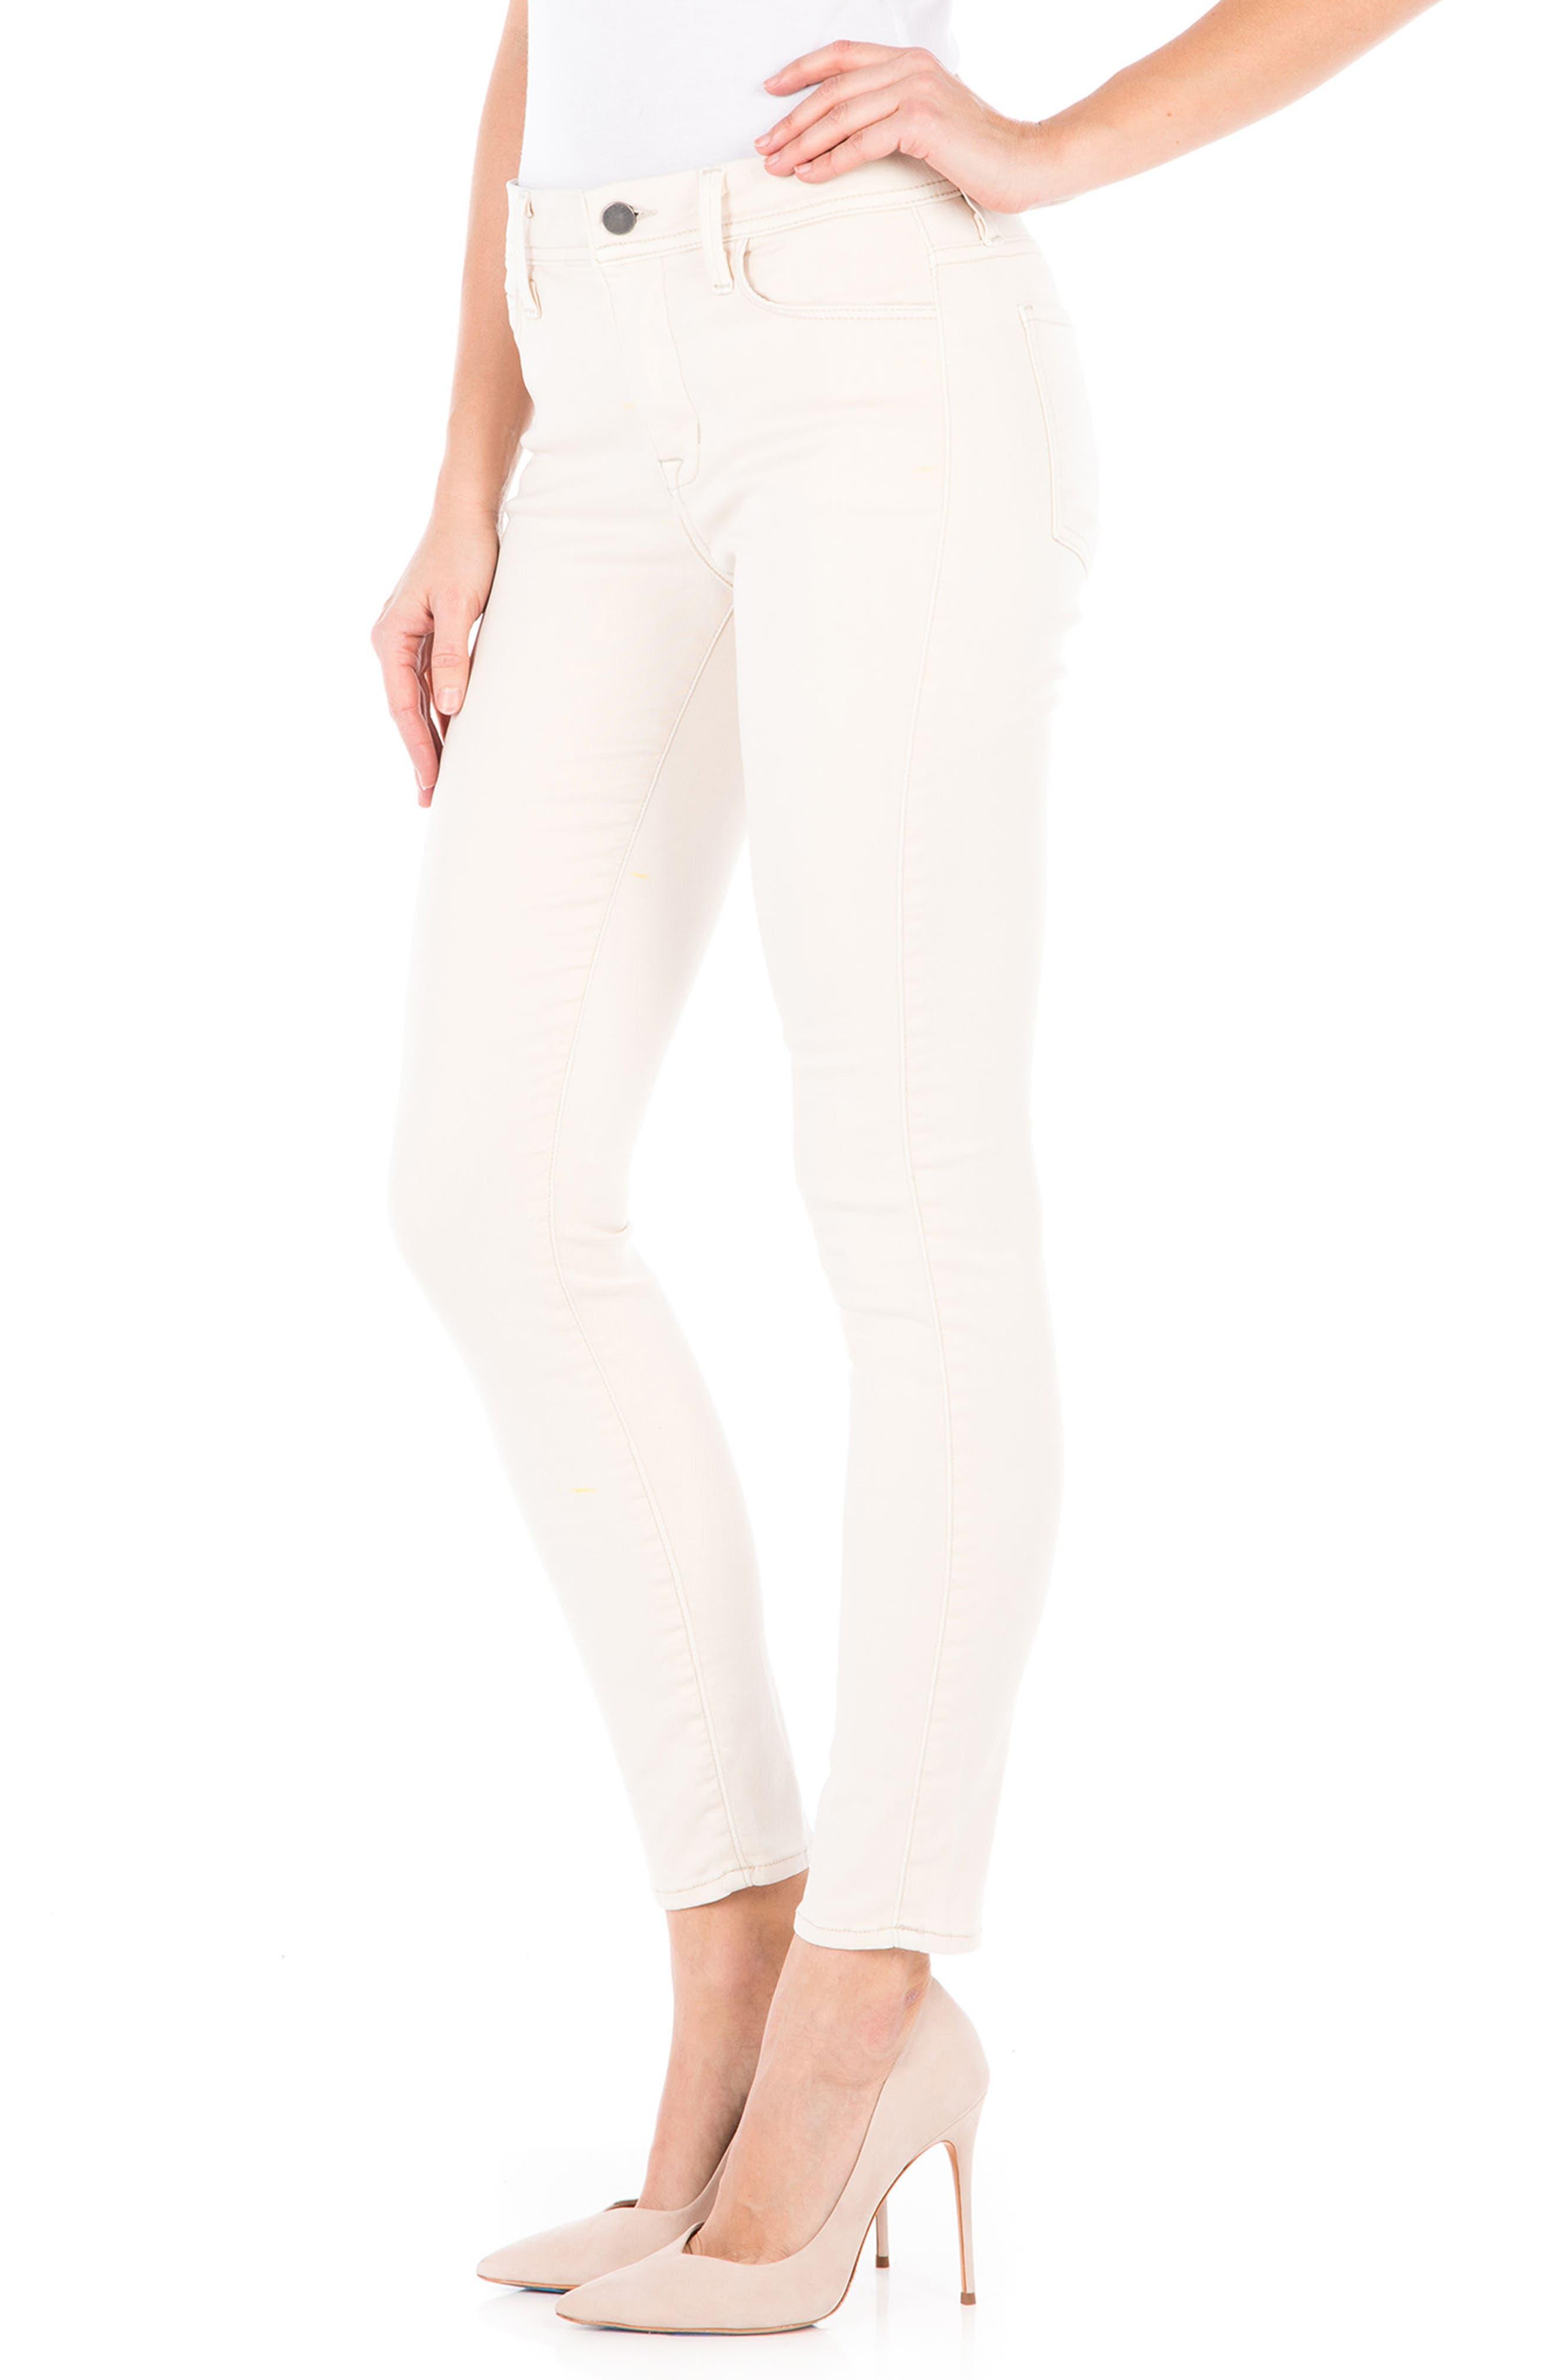 Sola Skinny Jeans,                             Alternate thumbnail 3, color,                             100